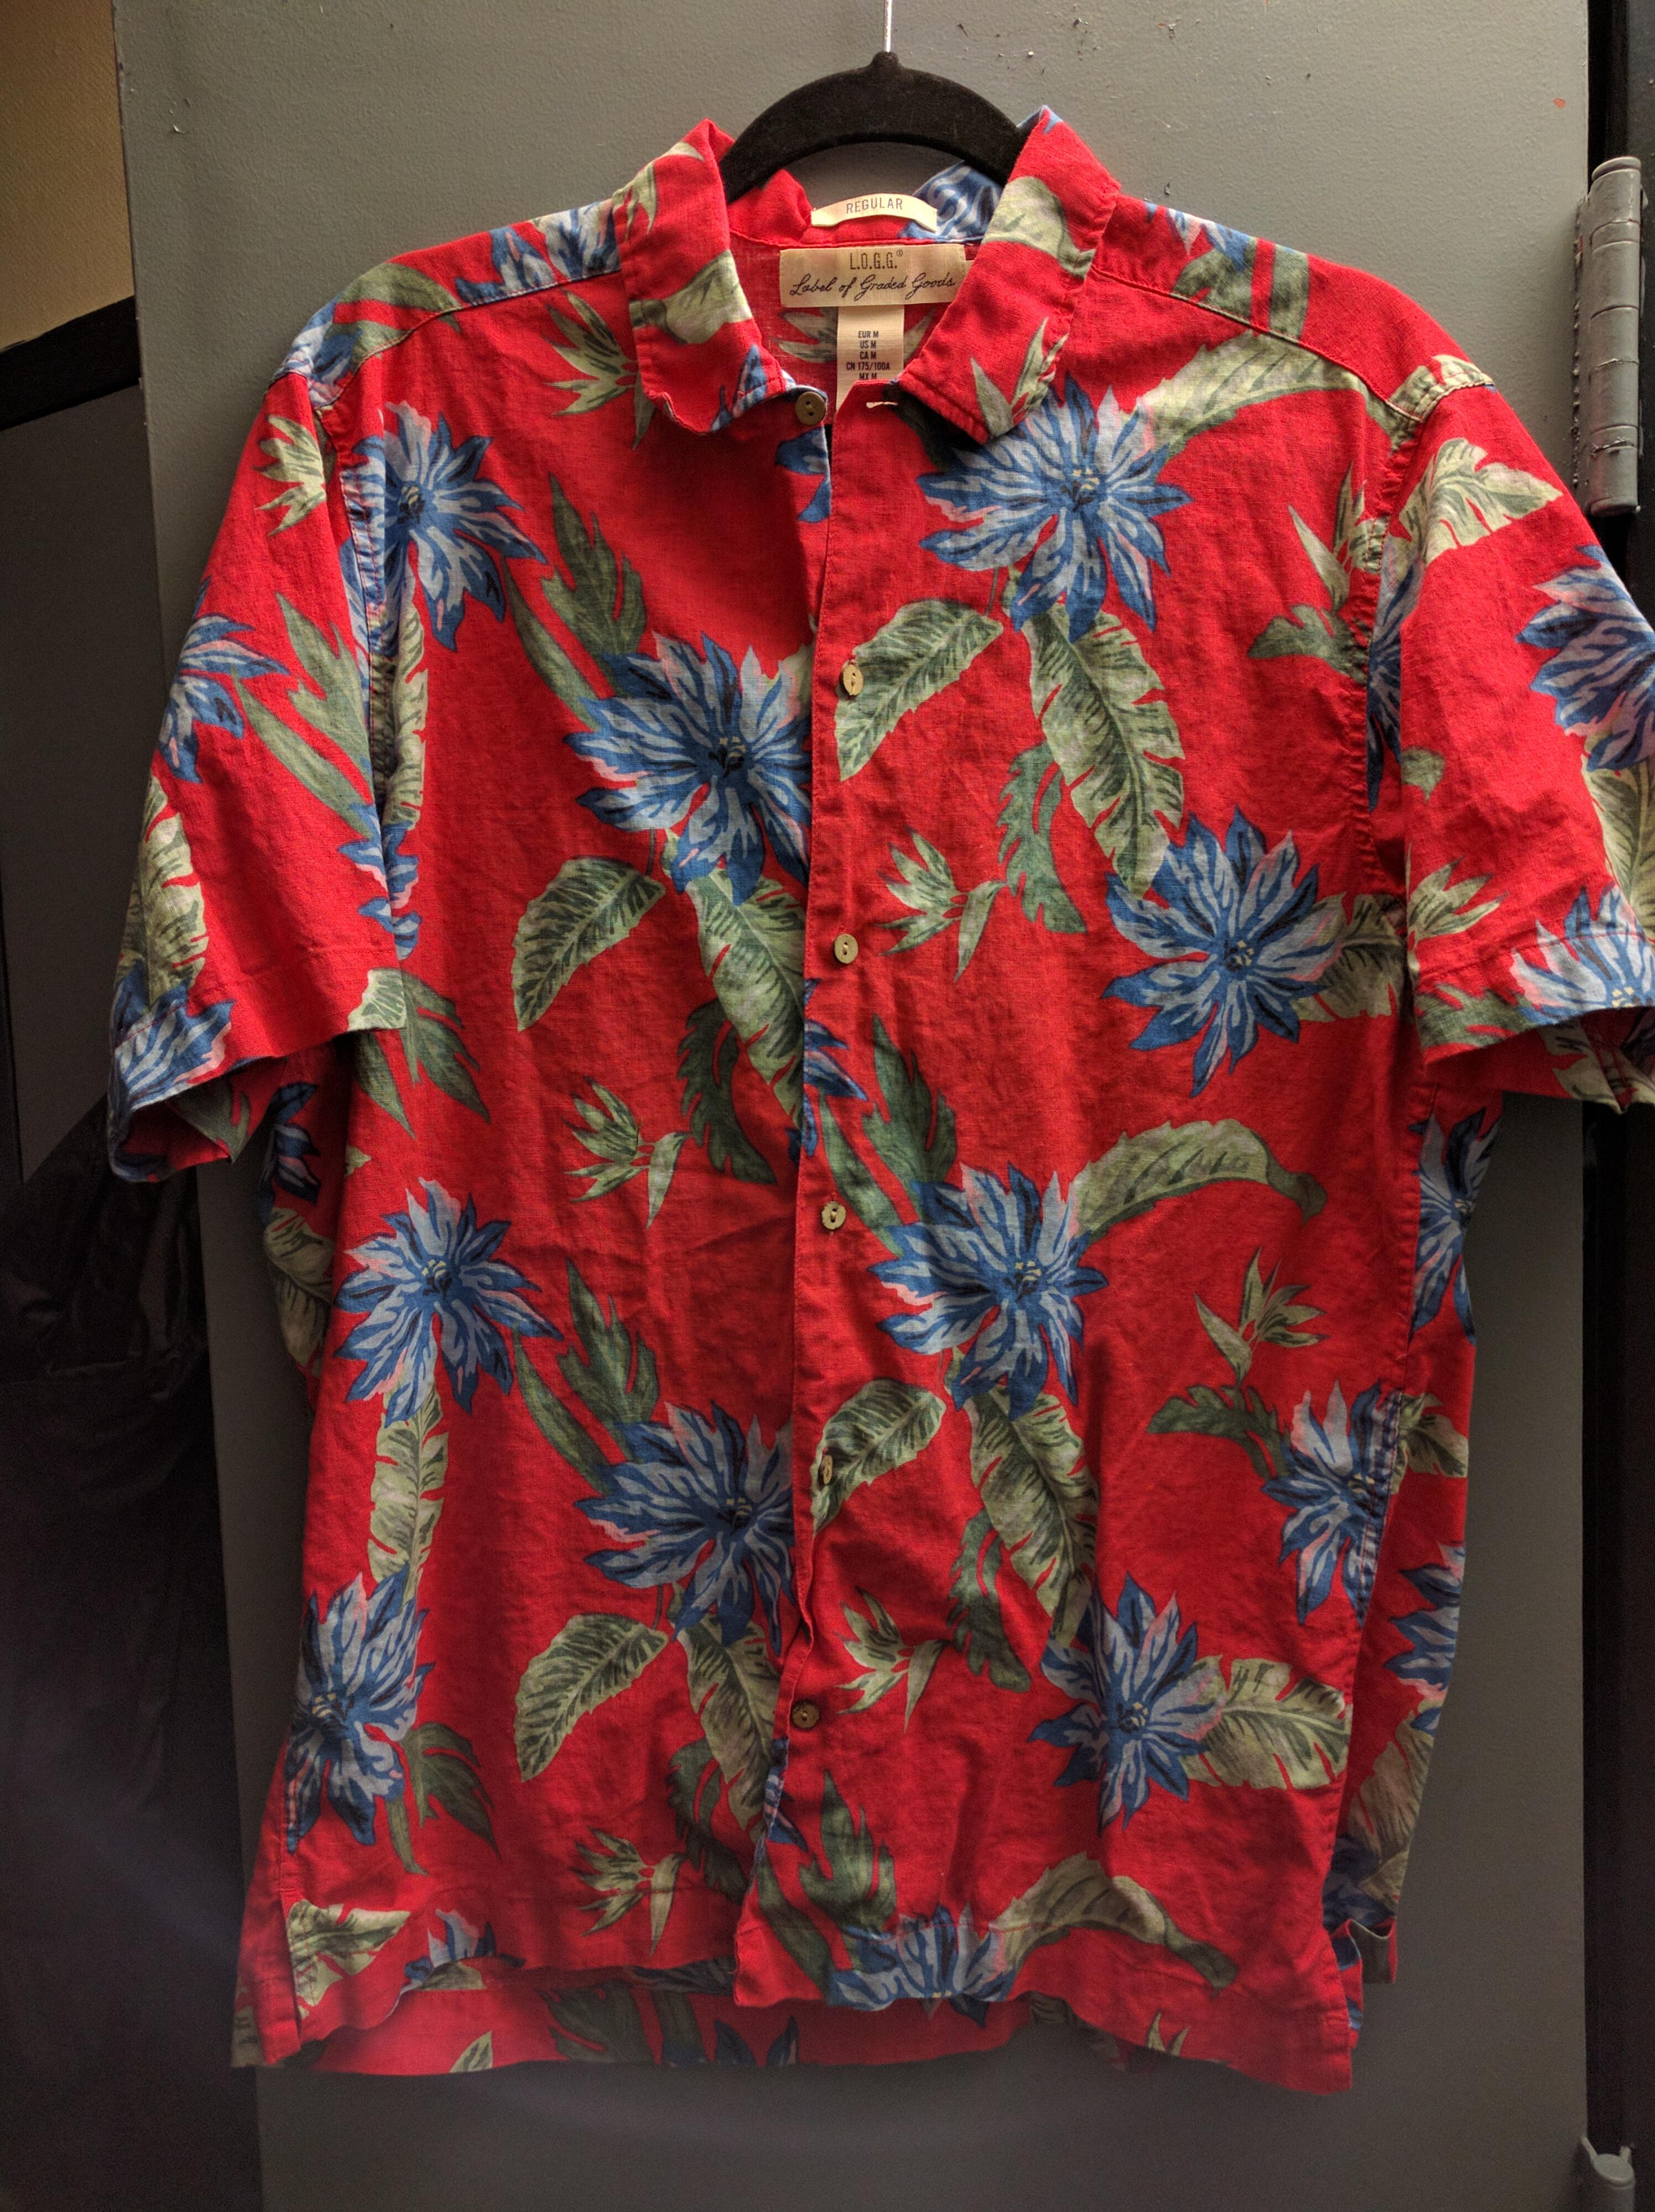 e06531dc H&m Hawaiian Shirt | Grailed